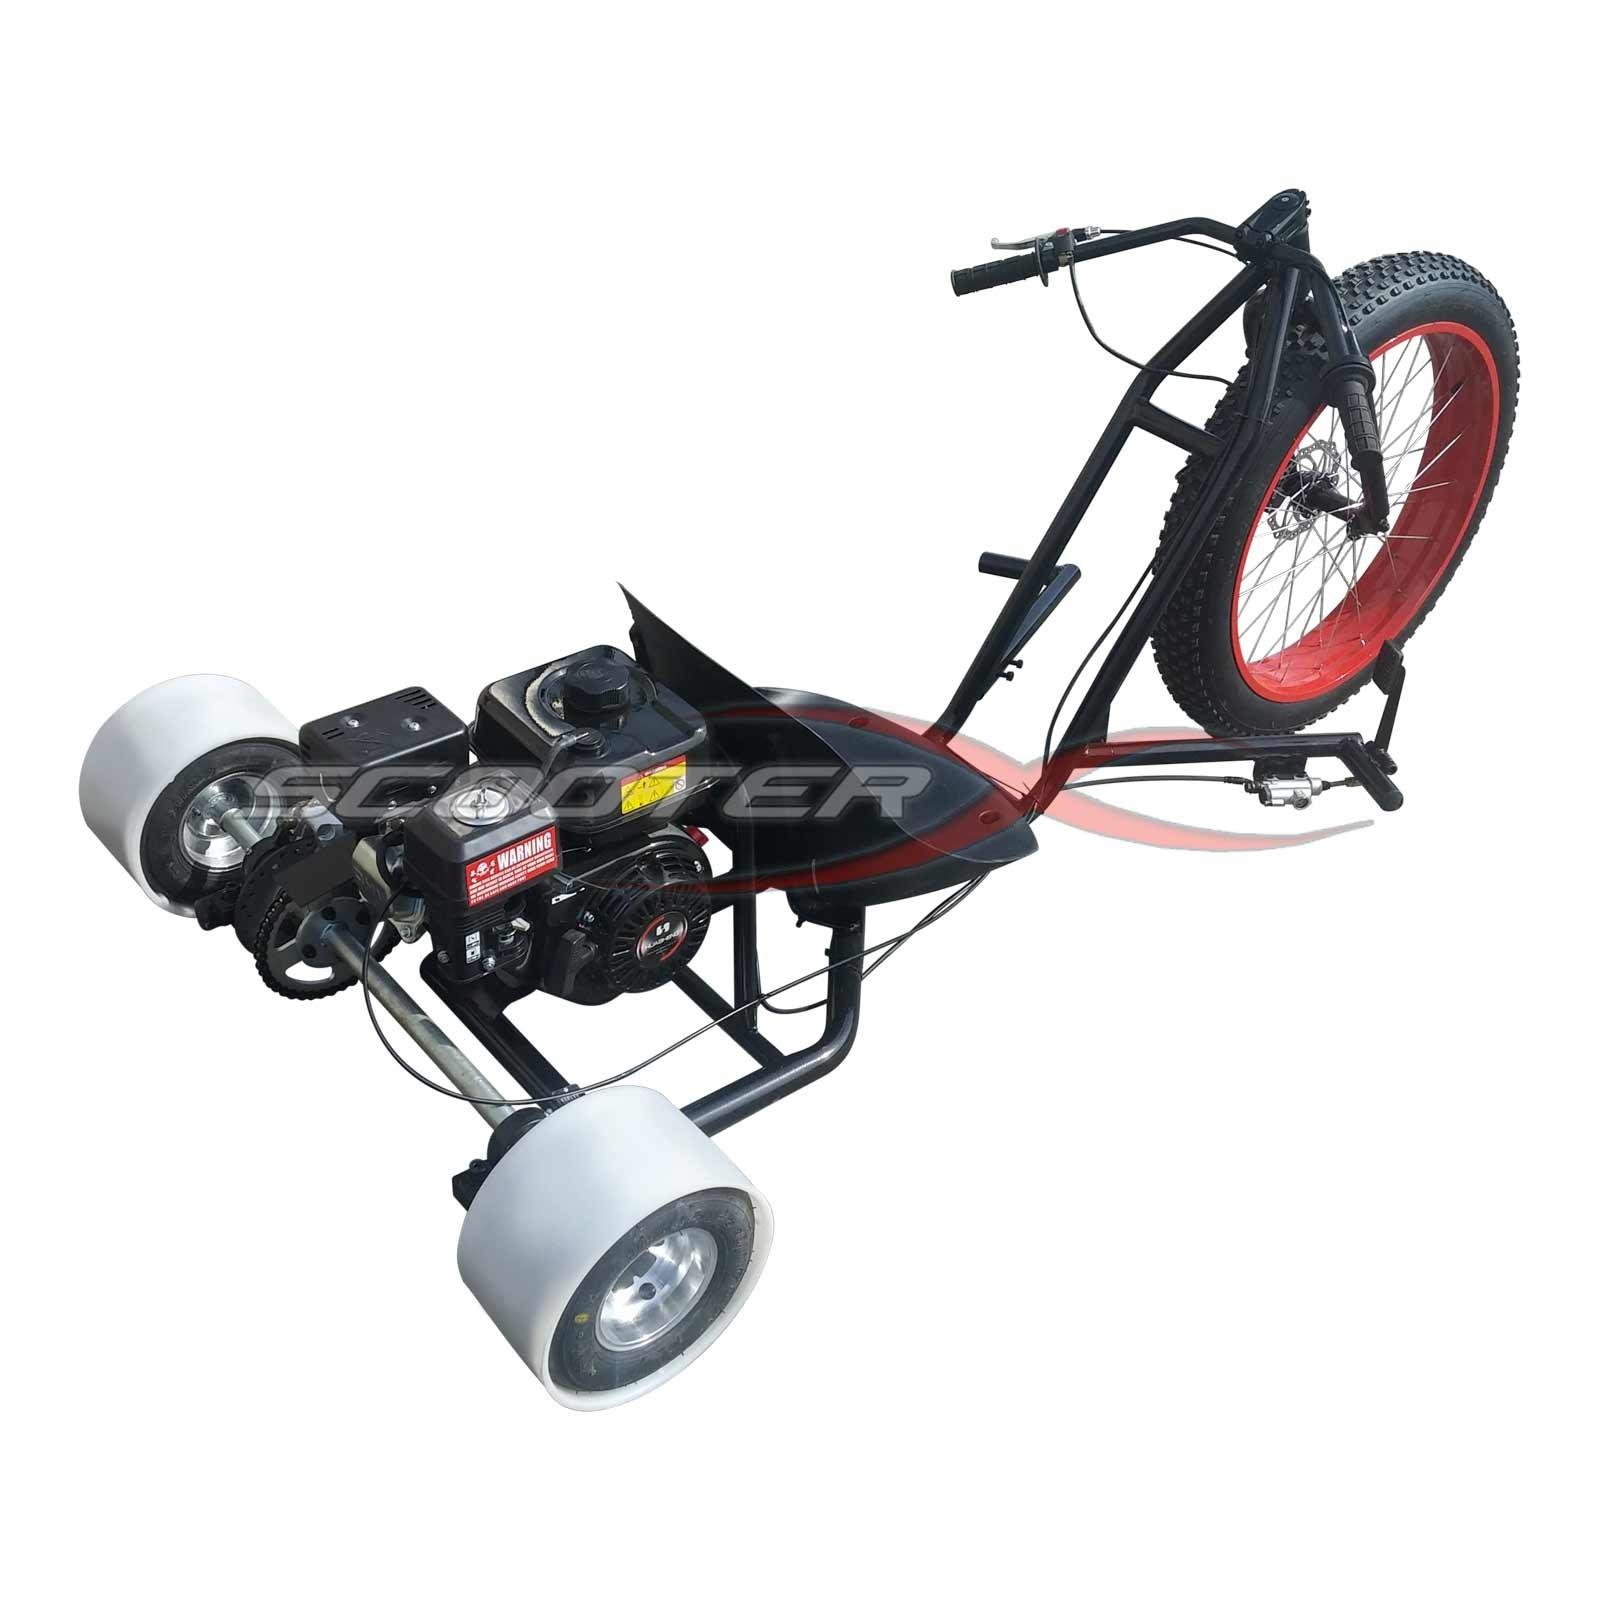 6 5hp Gas Powered Scooterx Drift Trike Aka Big Wheel 3